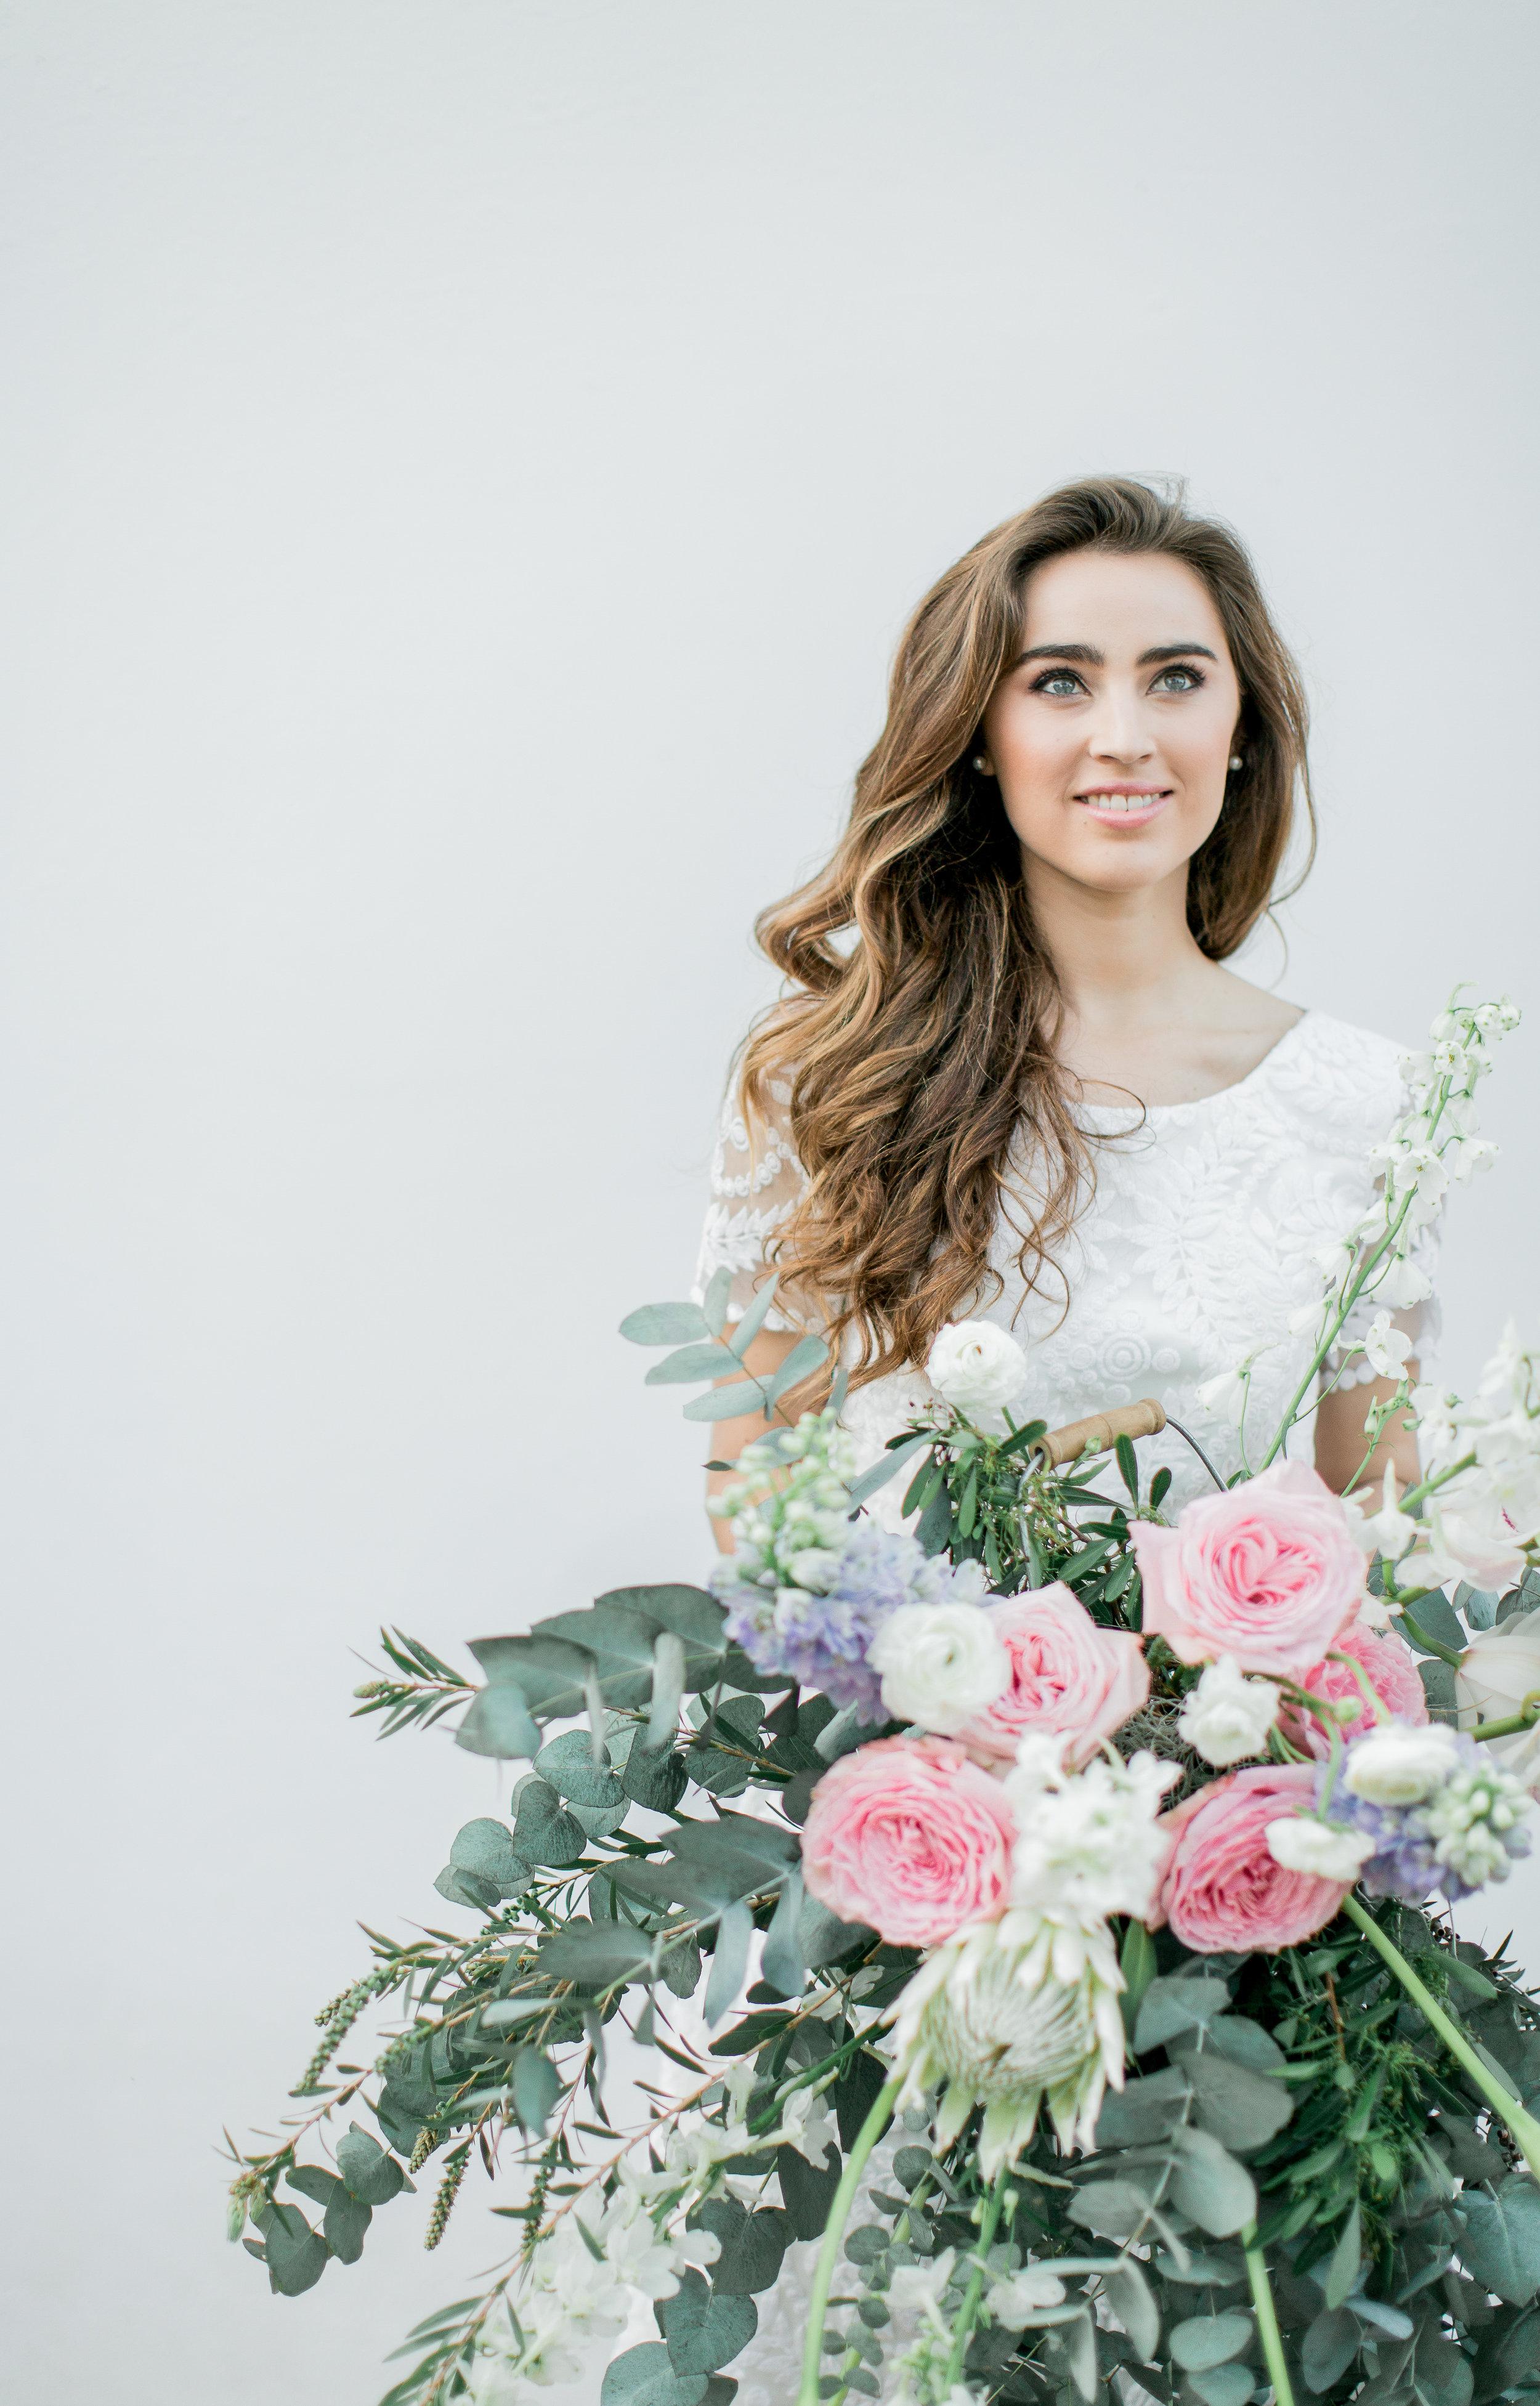 gauteng wedding photographer clareece smit15.jpg